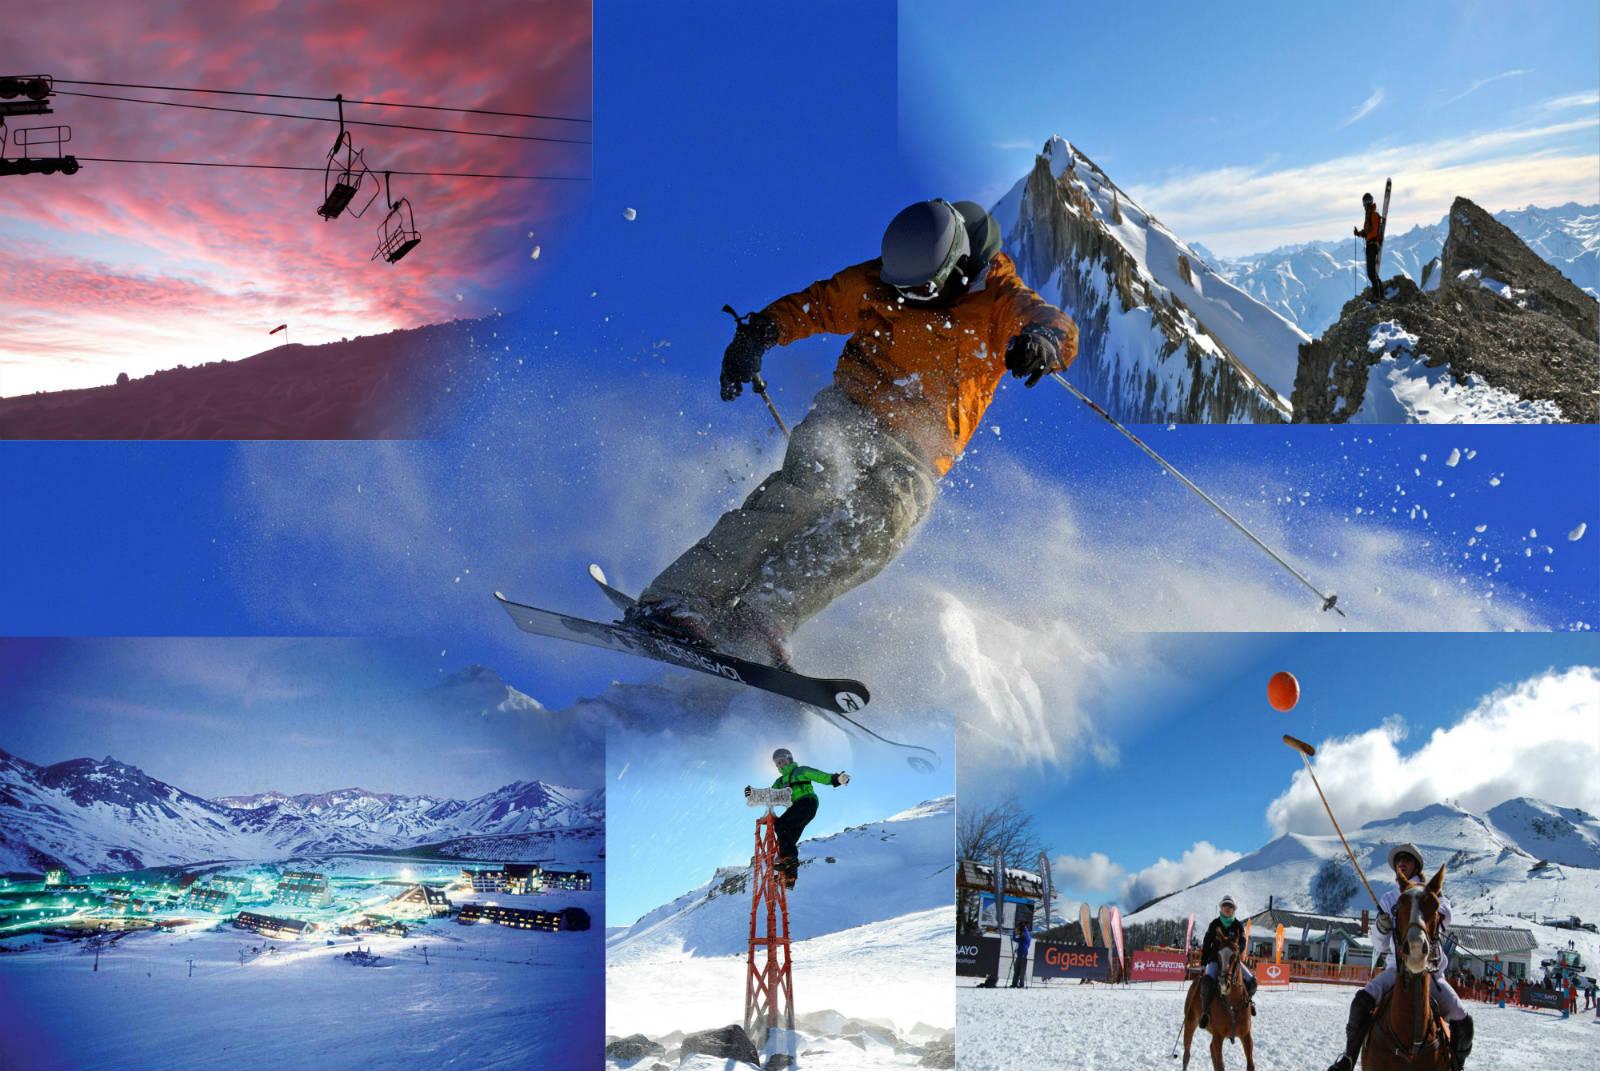 Argentina: Irresistible ski heaven